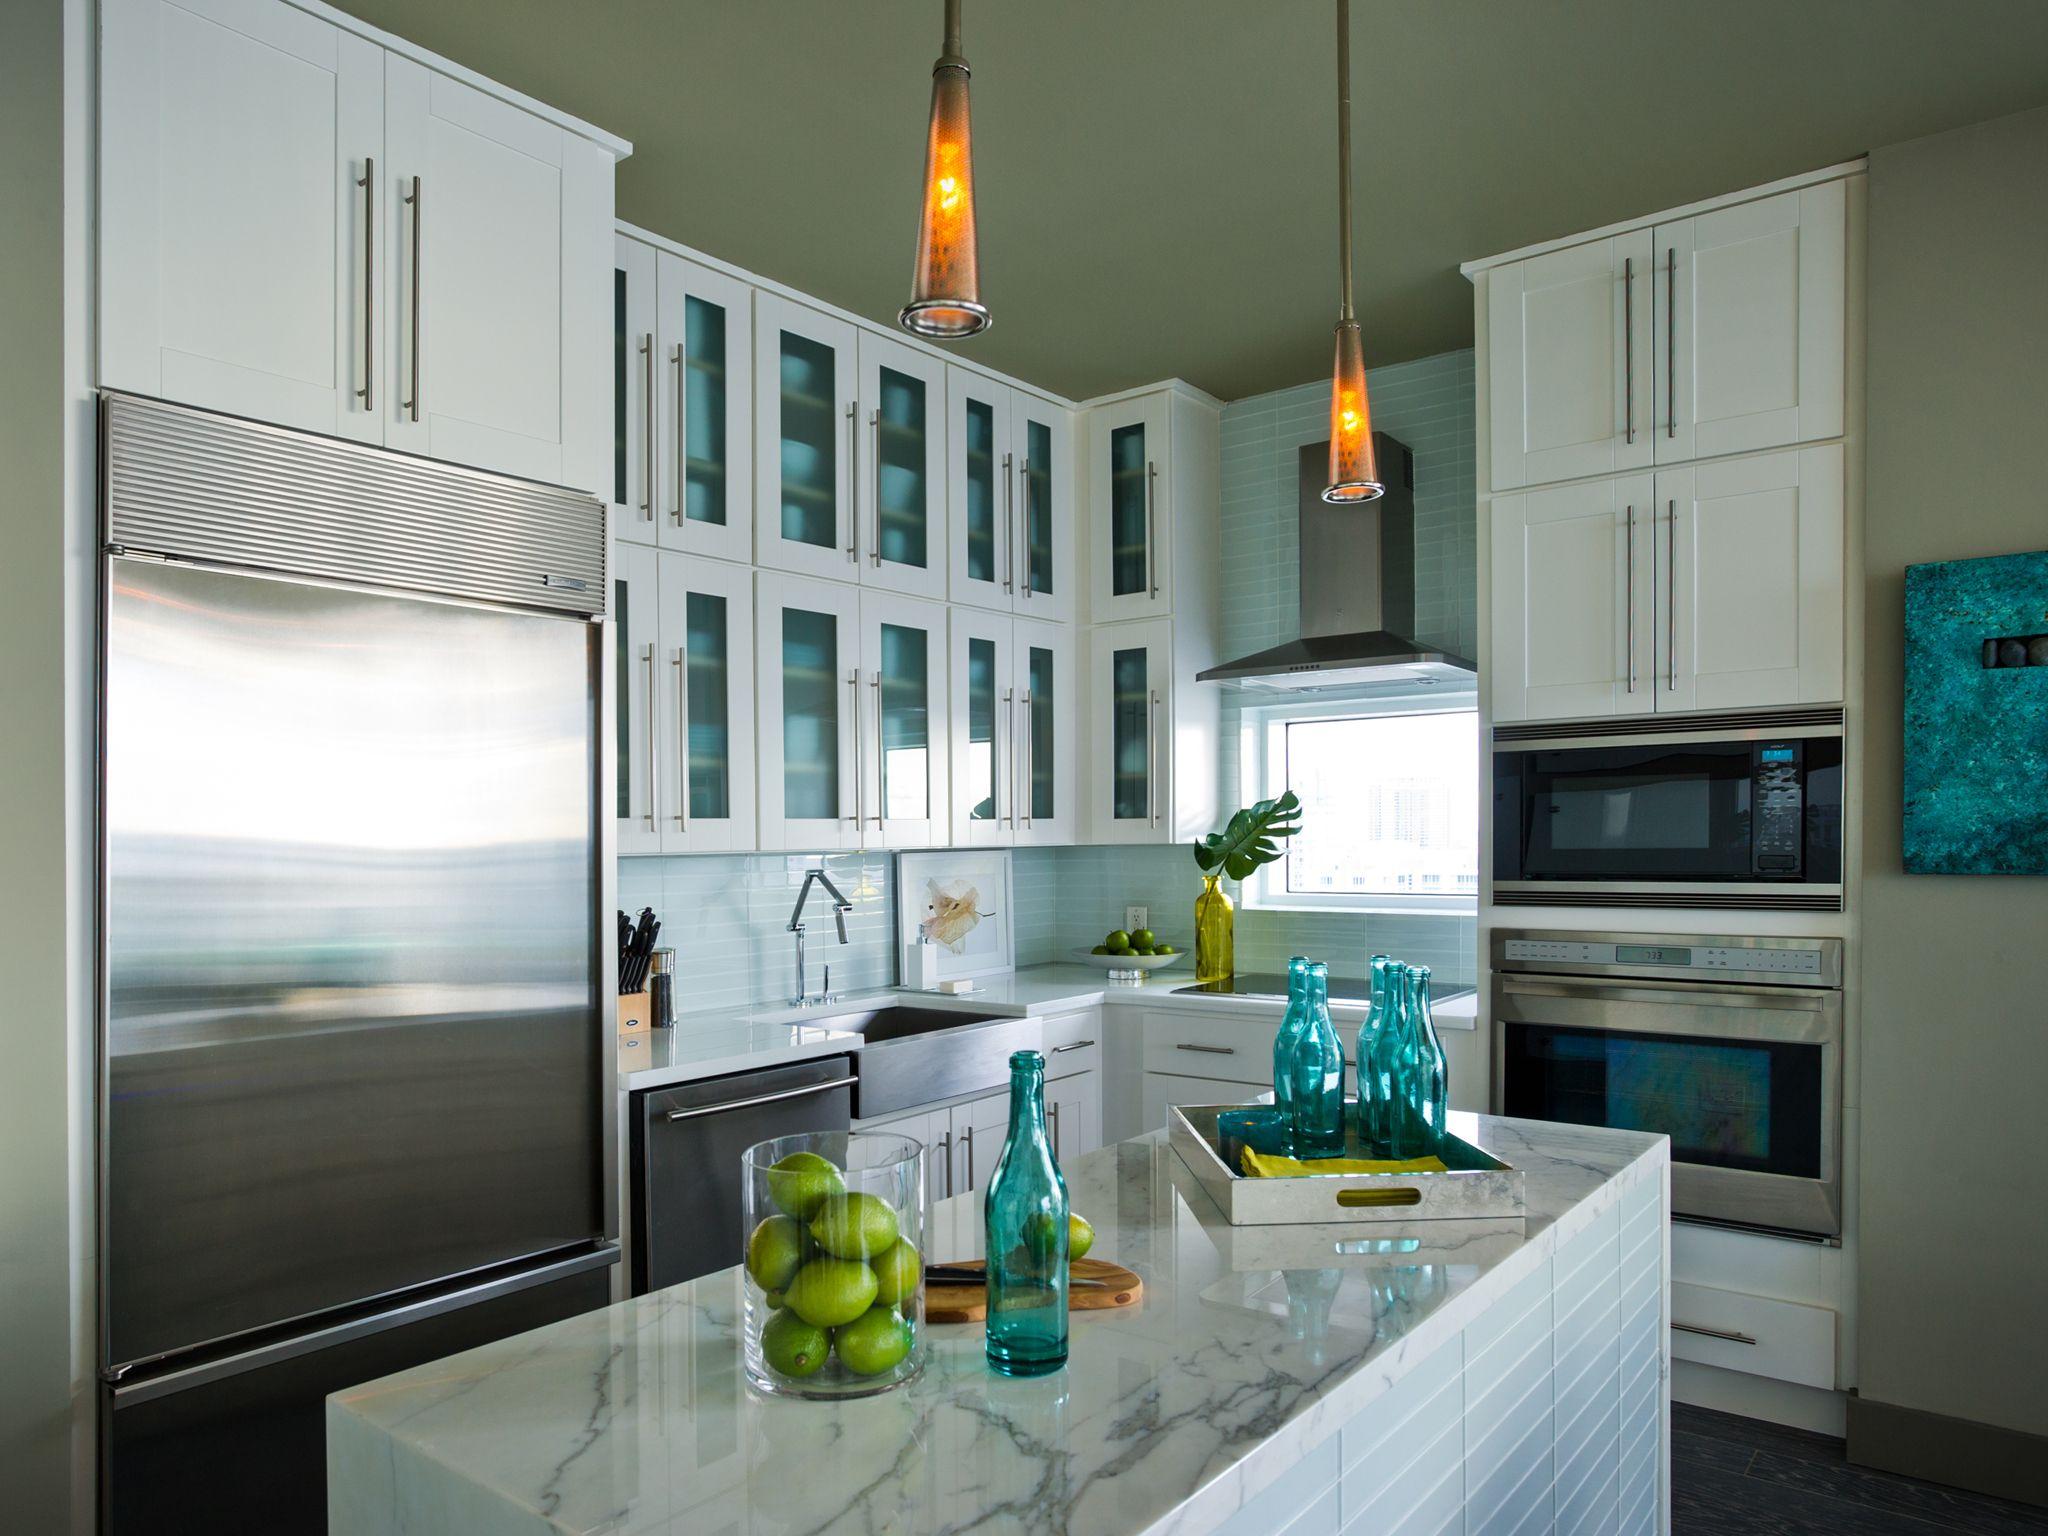 Kitchen of the HGTV Urban Oasis 2012 located in Miami, FL.   Ideas ...